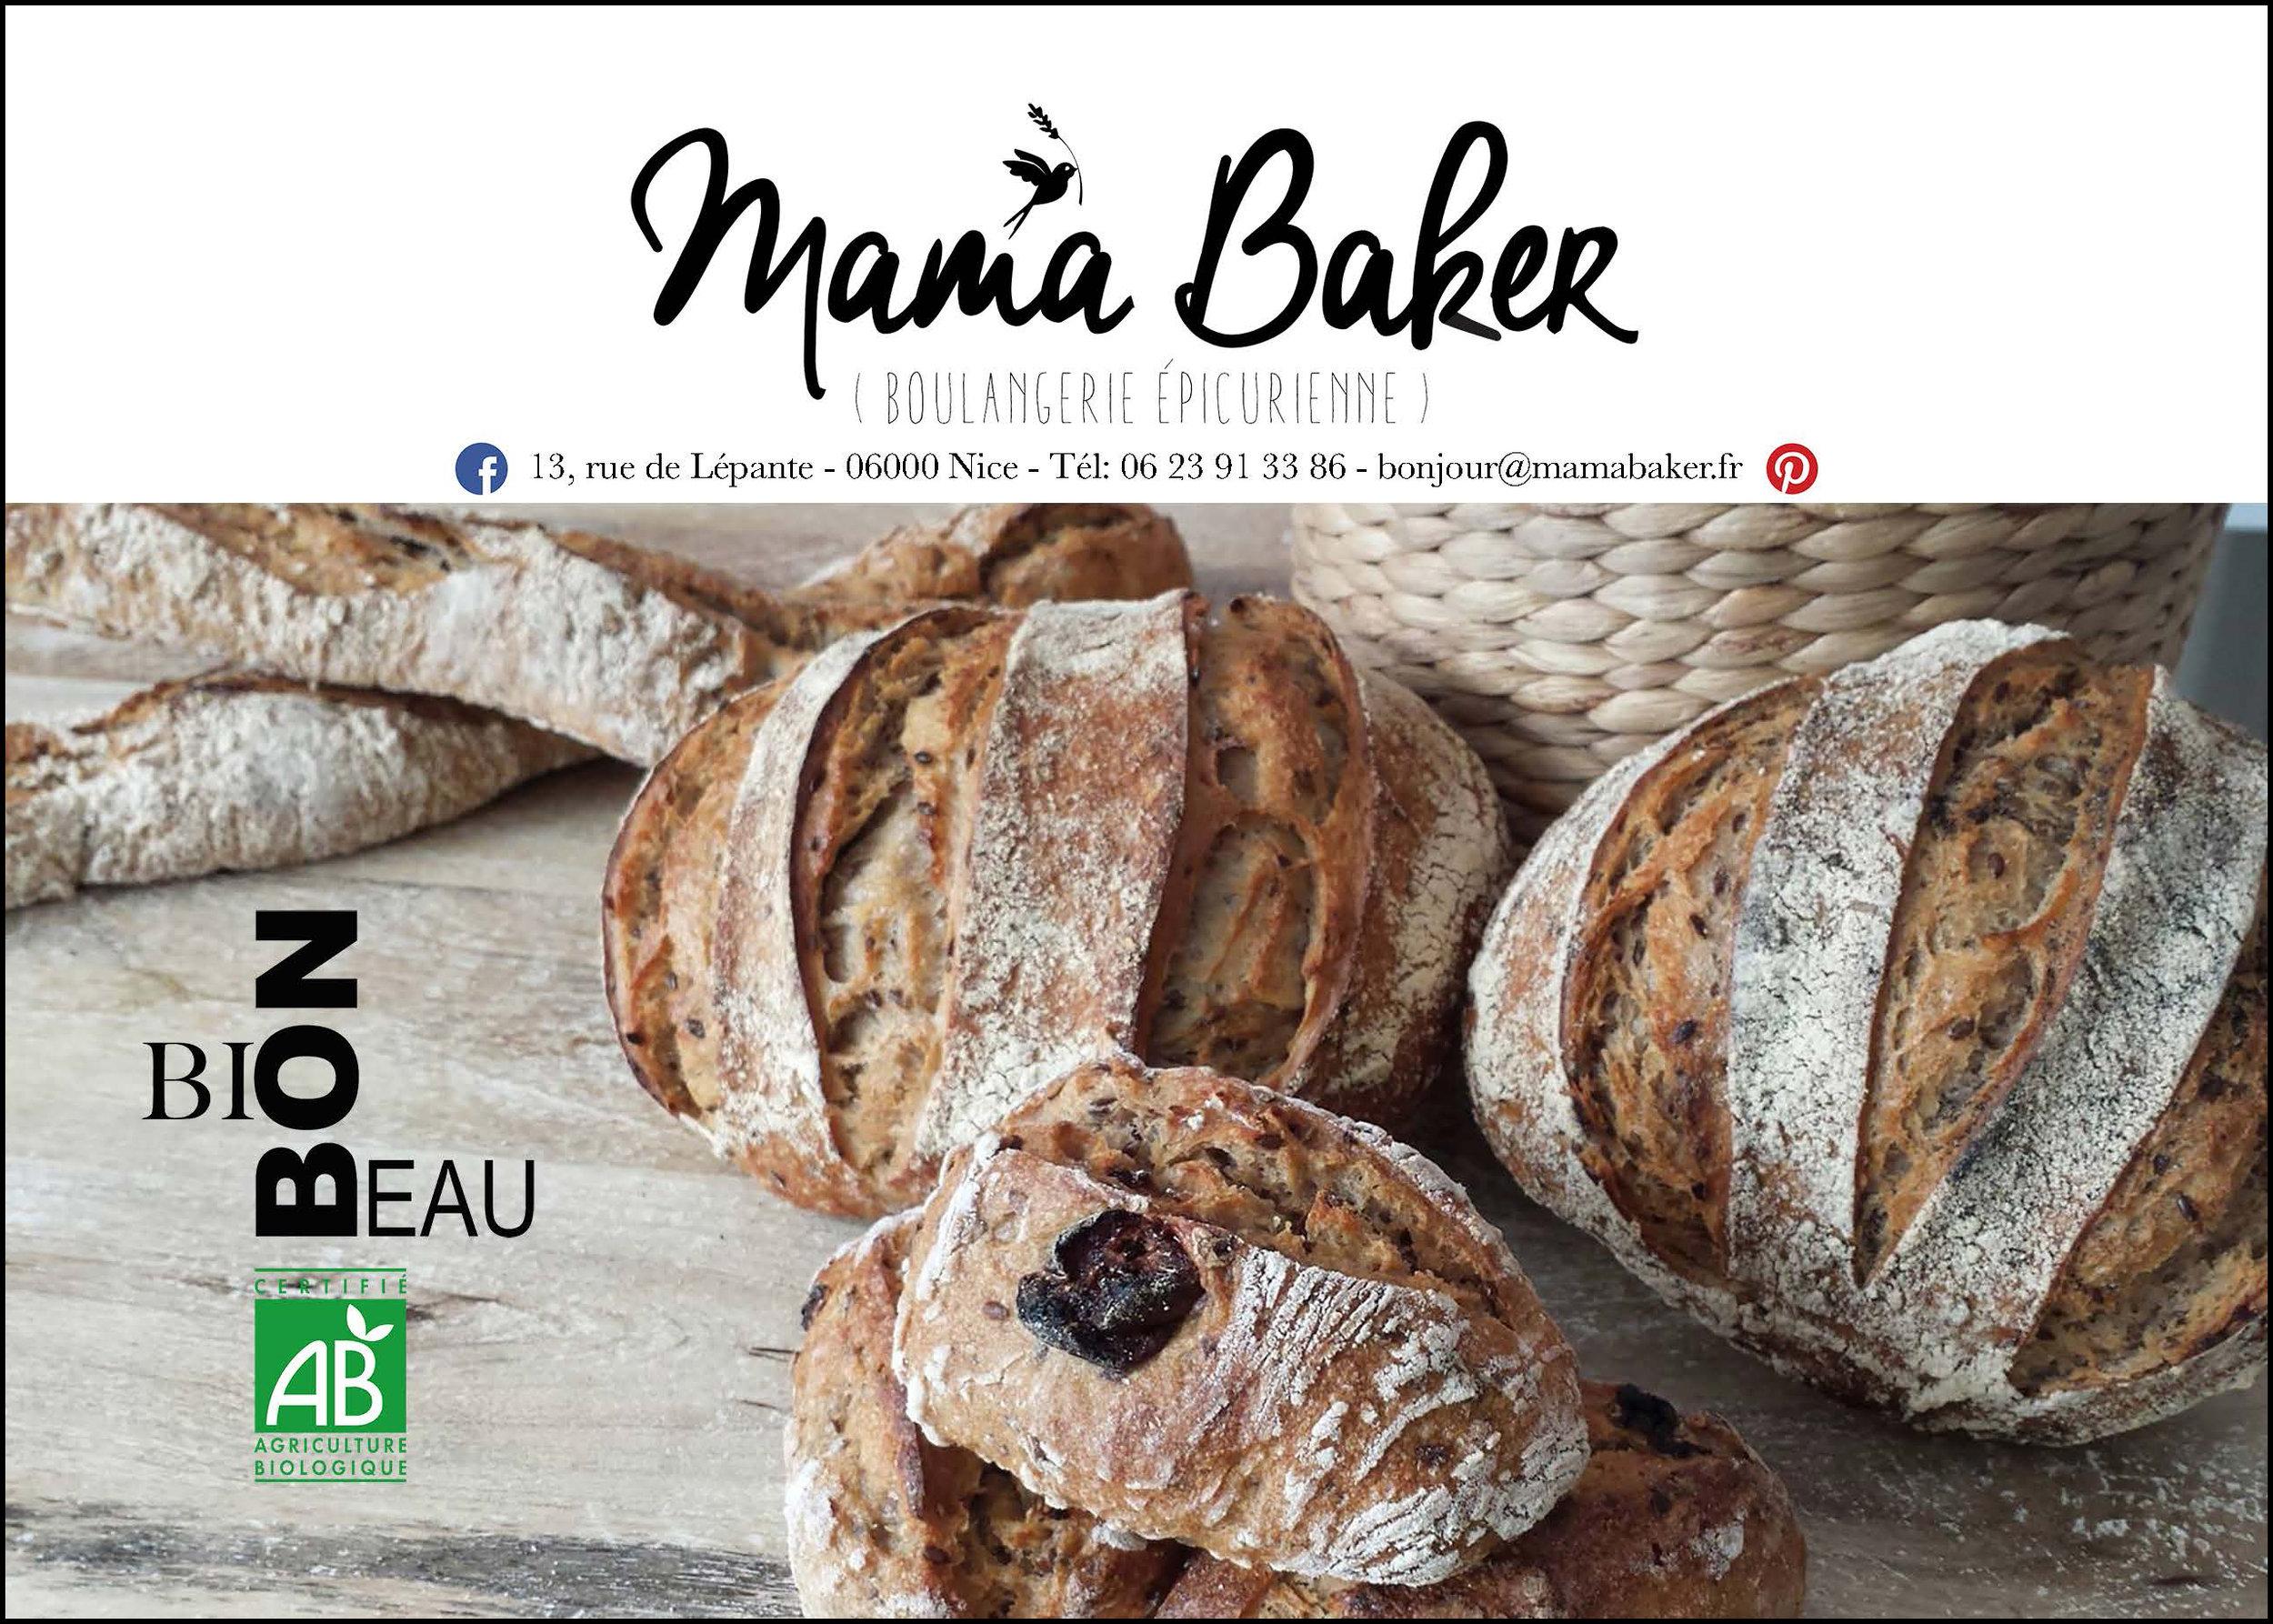 Mama baker N.jpg